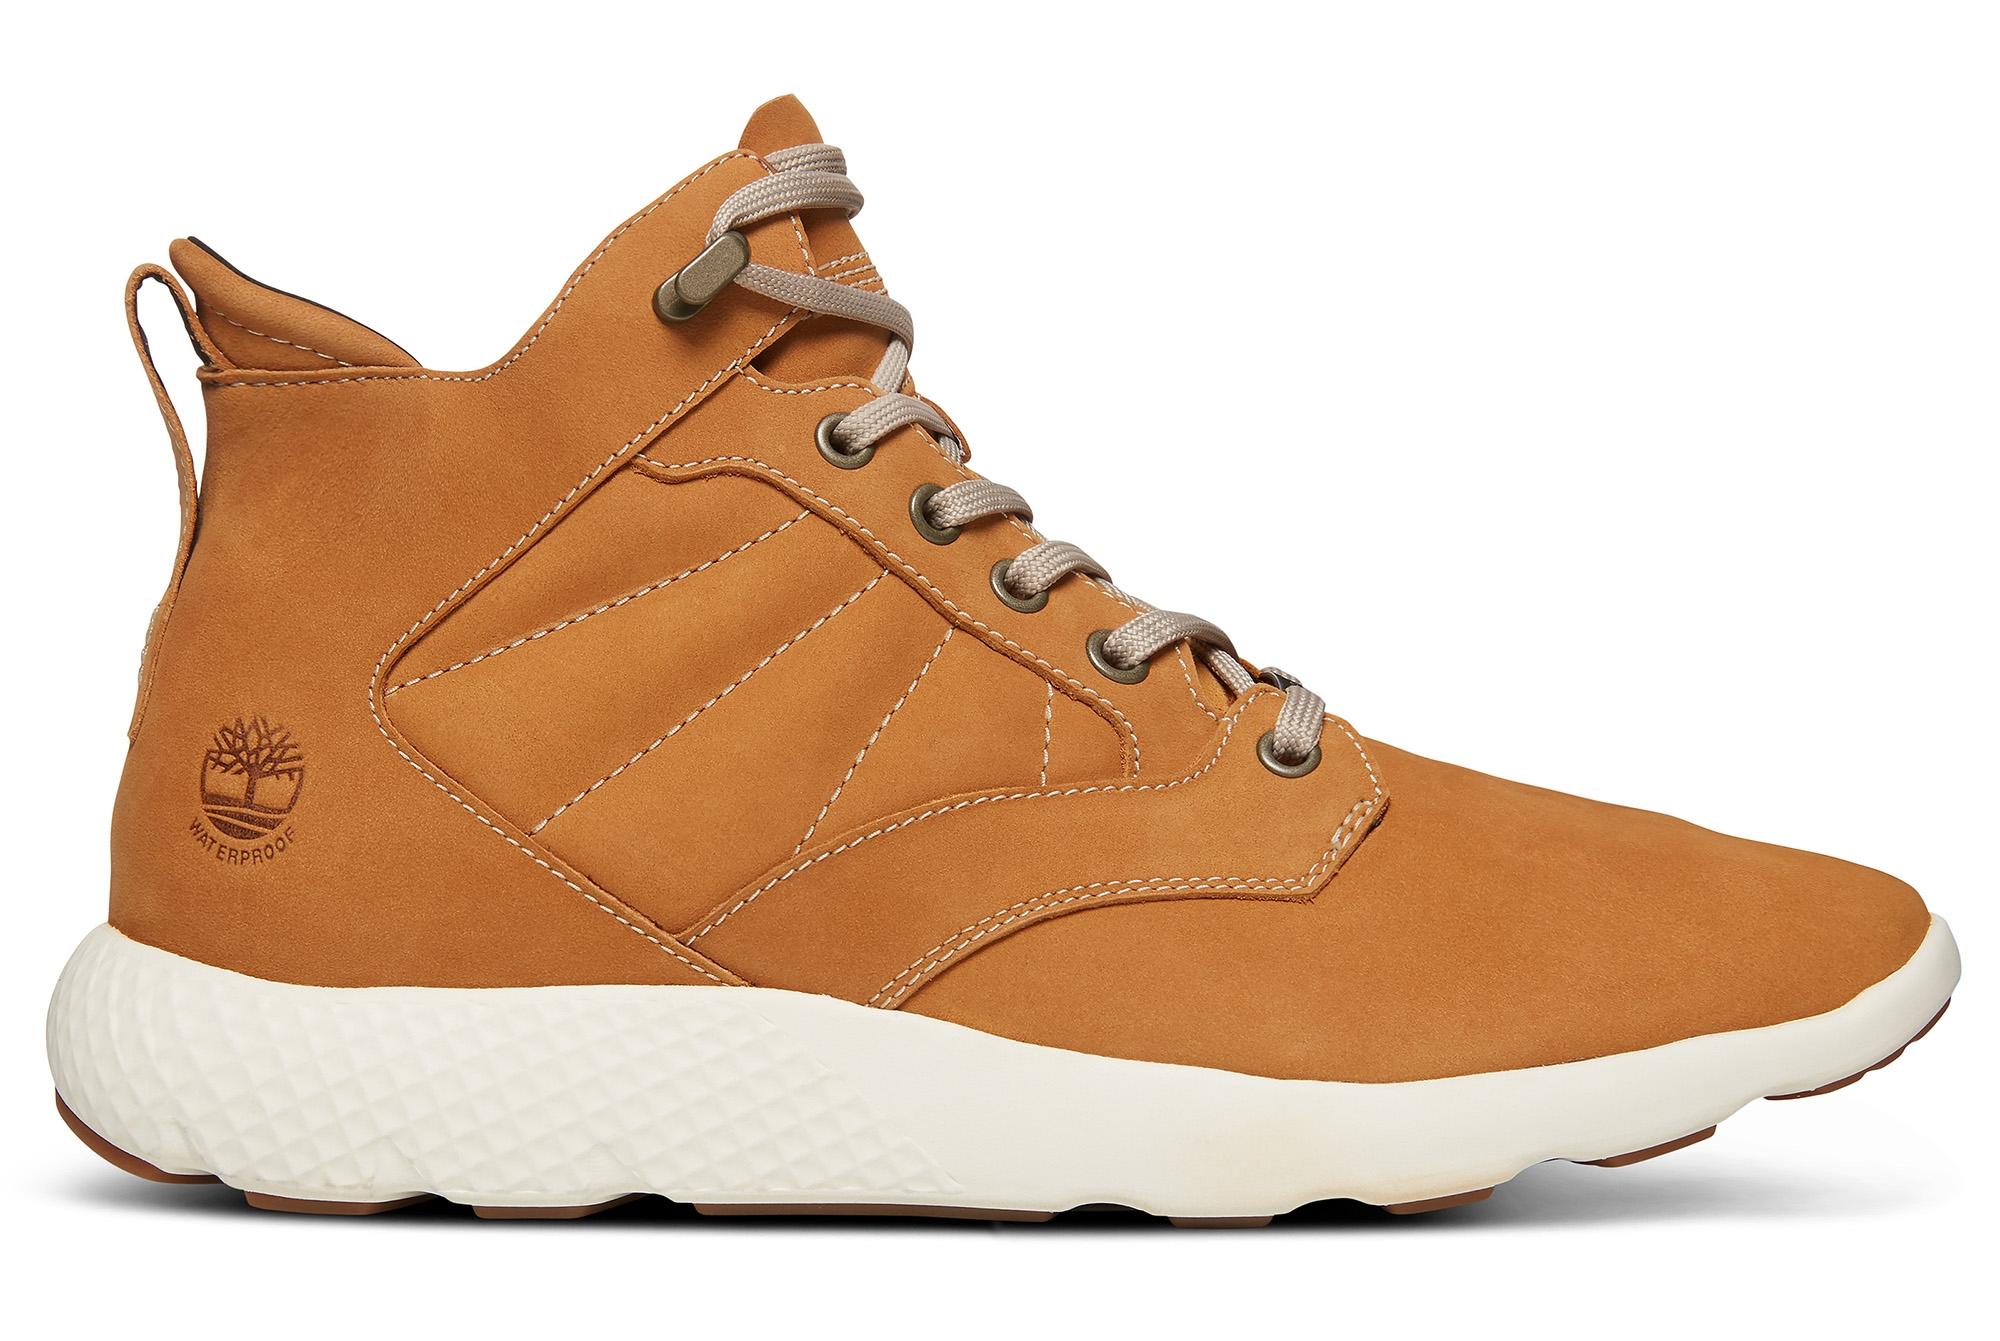 Wheat Precision Timberland Chaussures C Leather Wp Ski Flyroam w7wqOXB